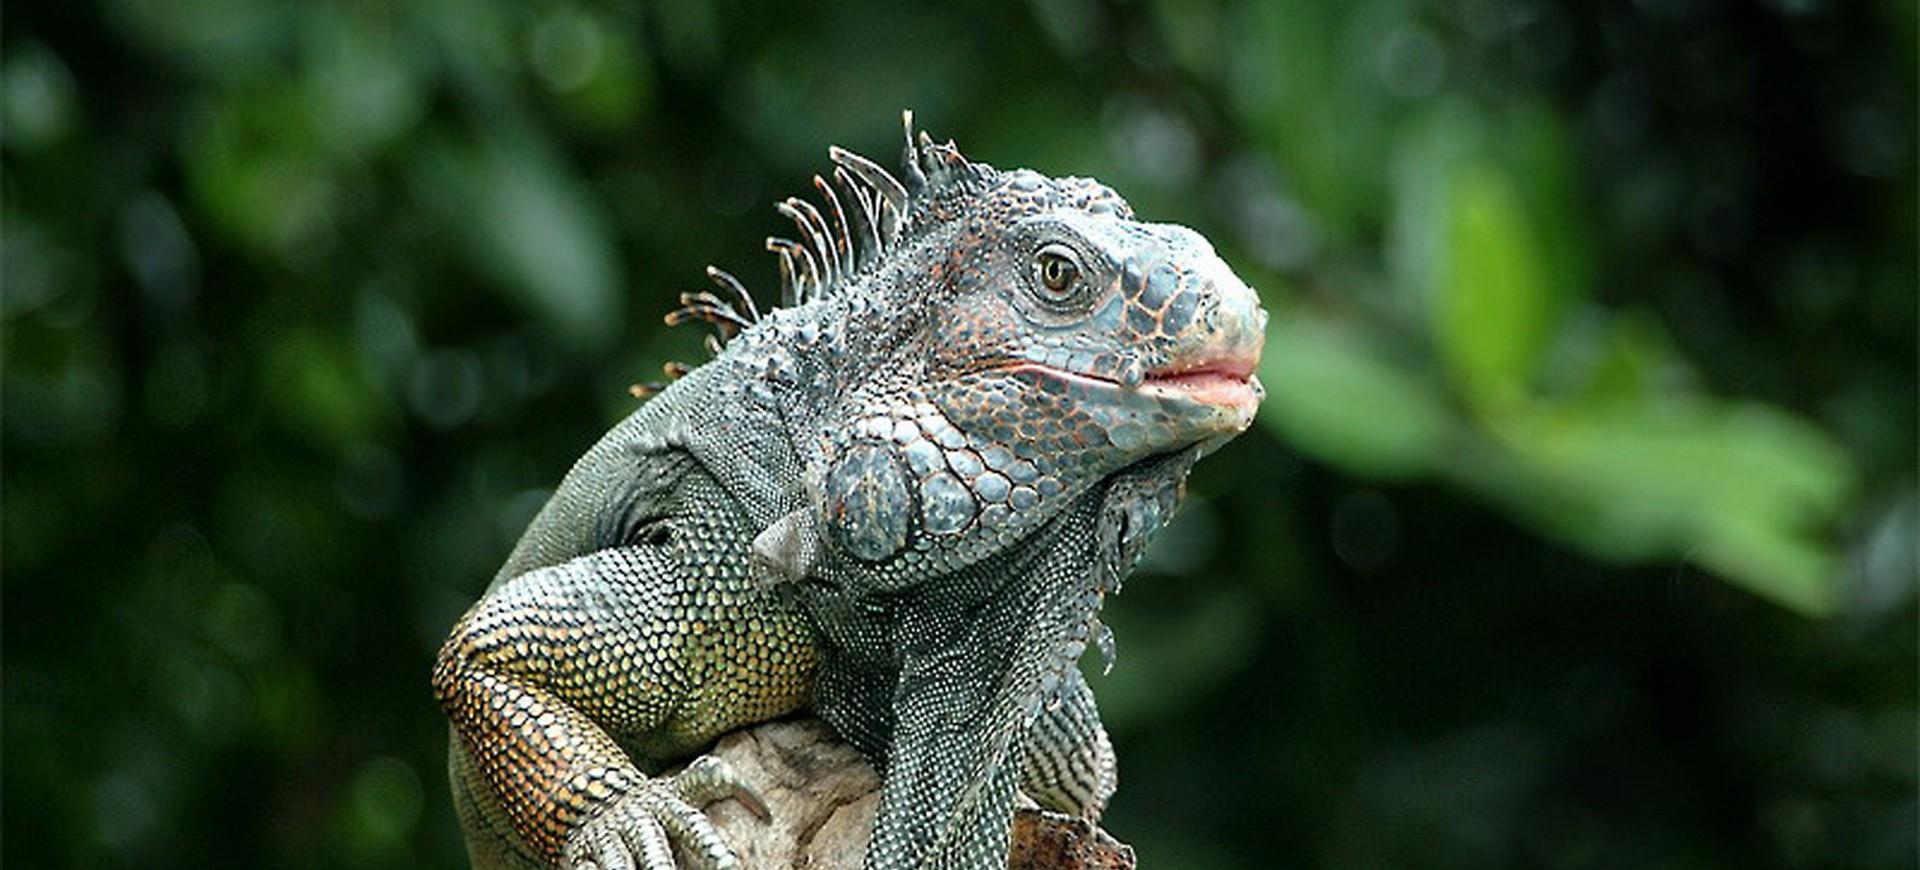 Iguane dans la forêt tropical au Costa Rica